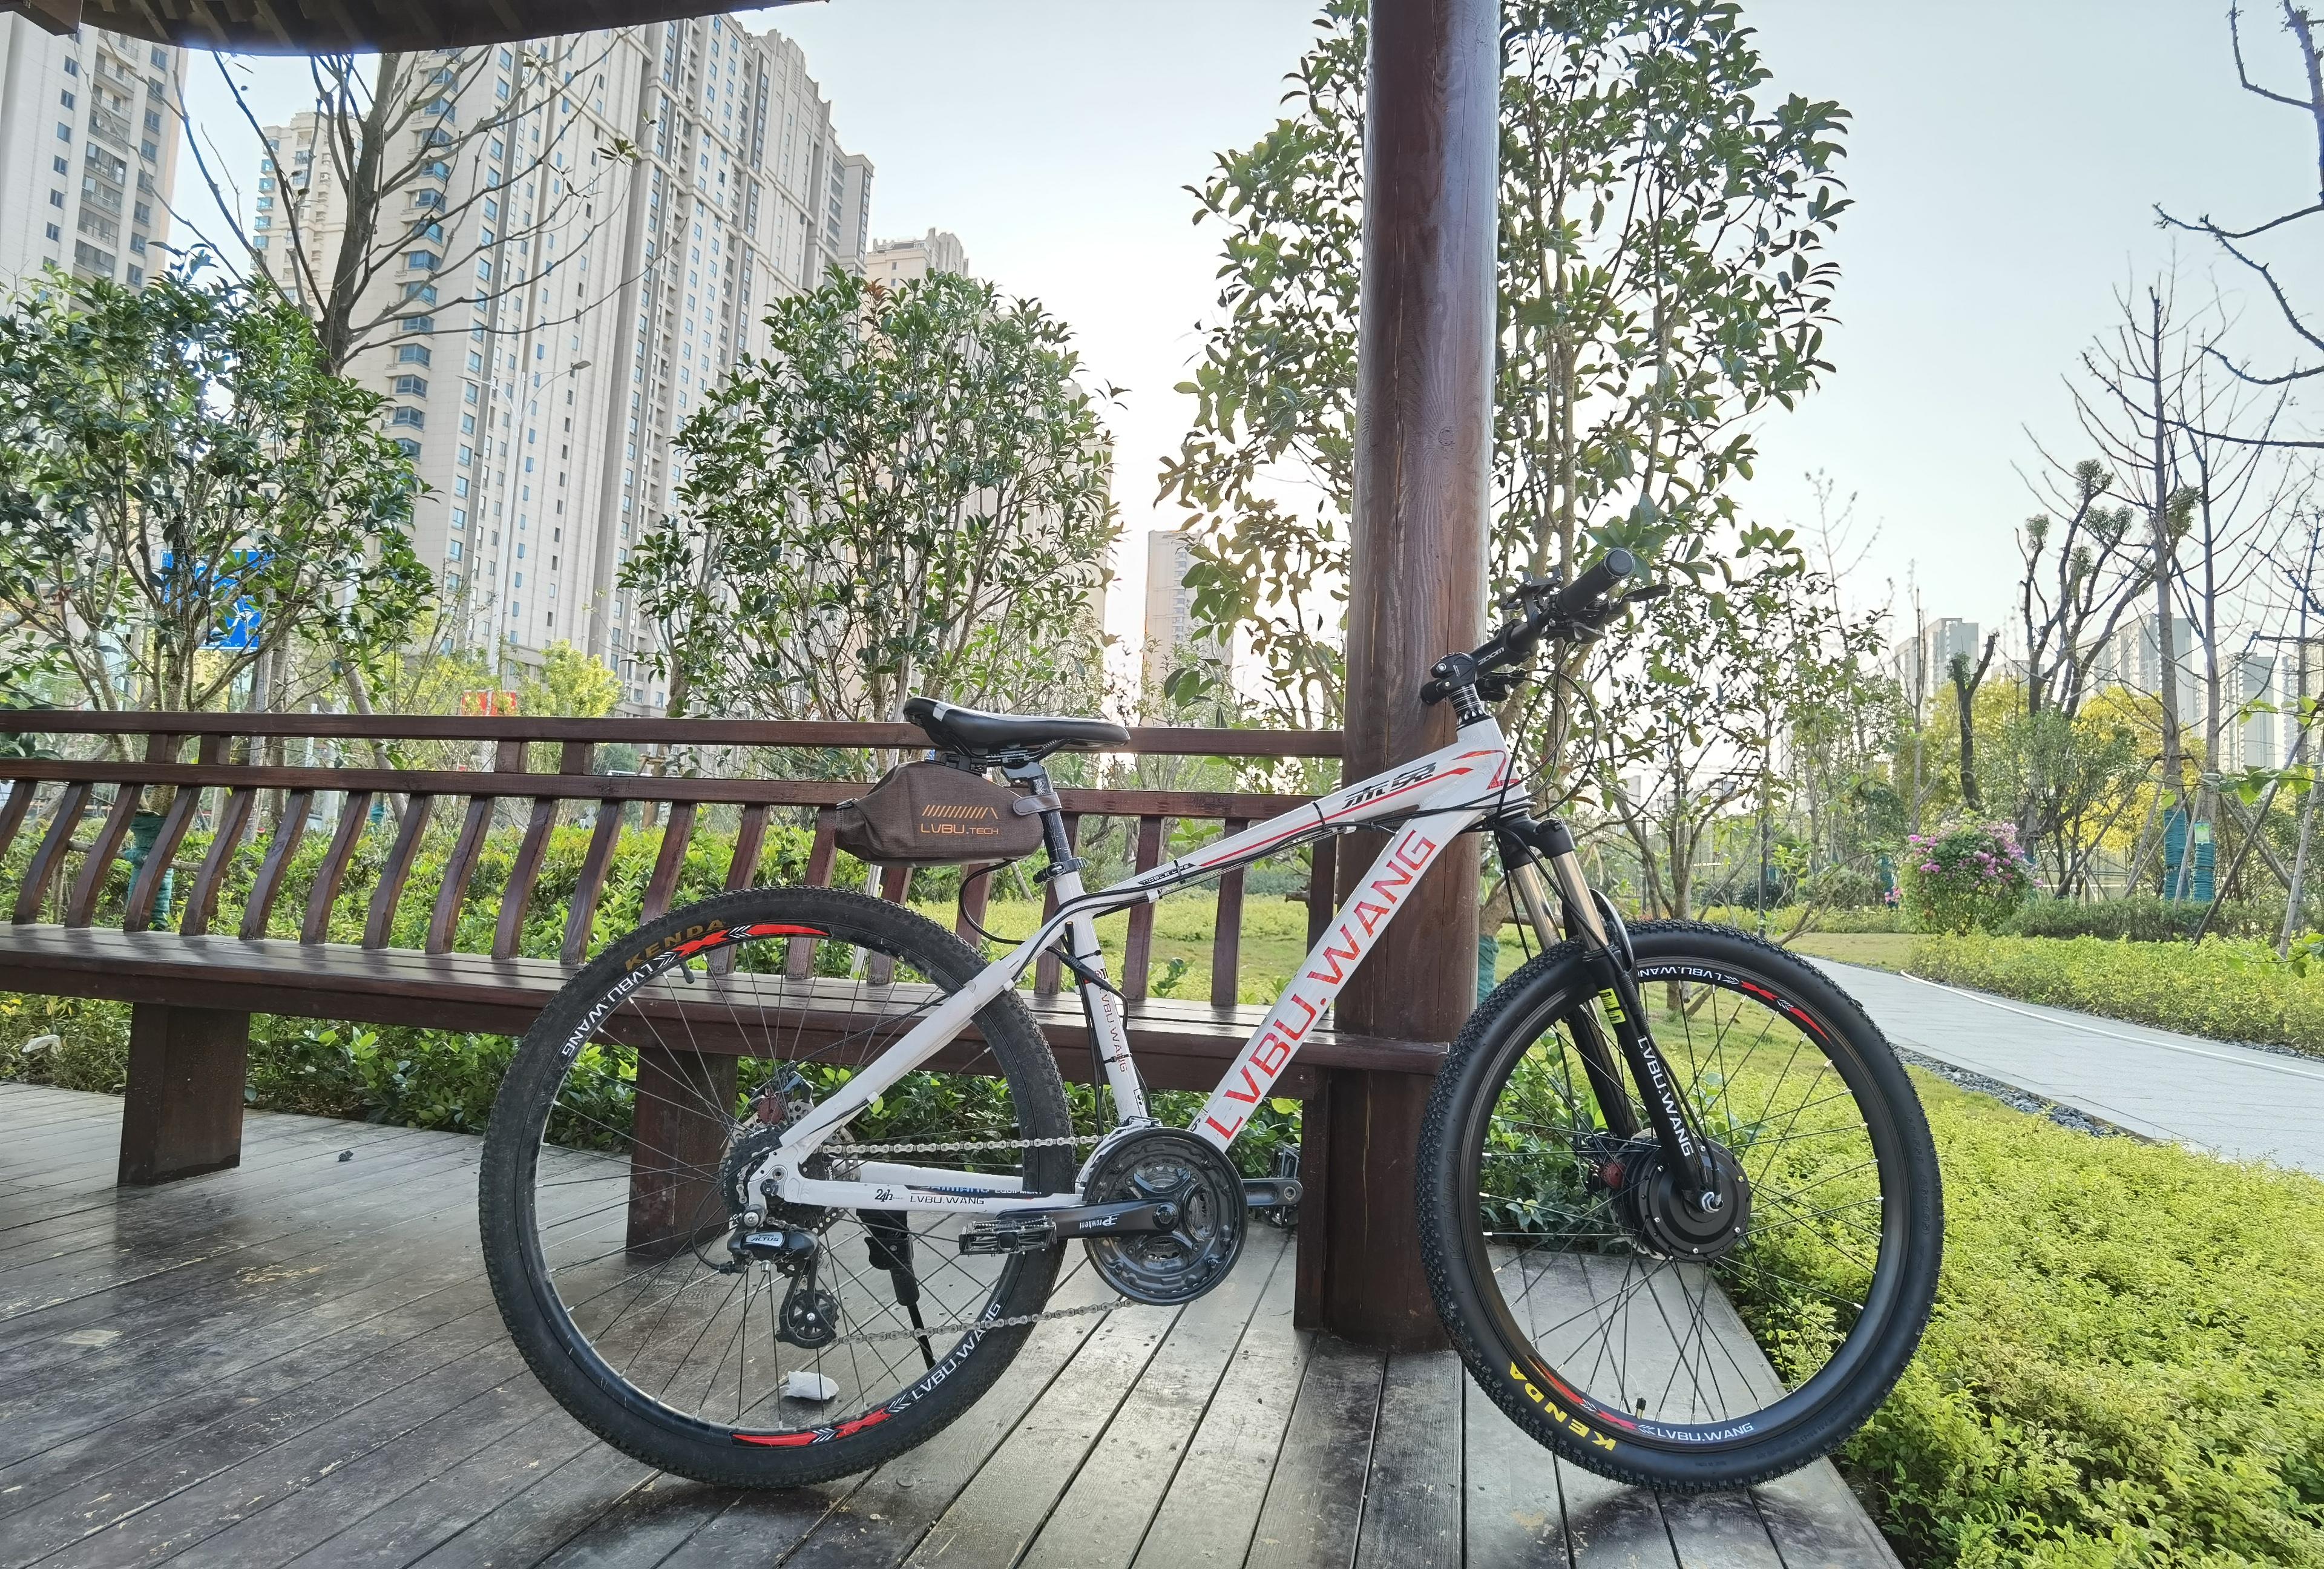 BT series BT series outdoor display picture